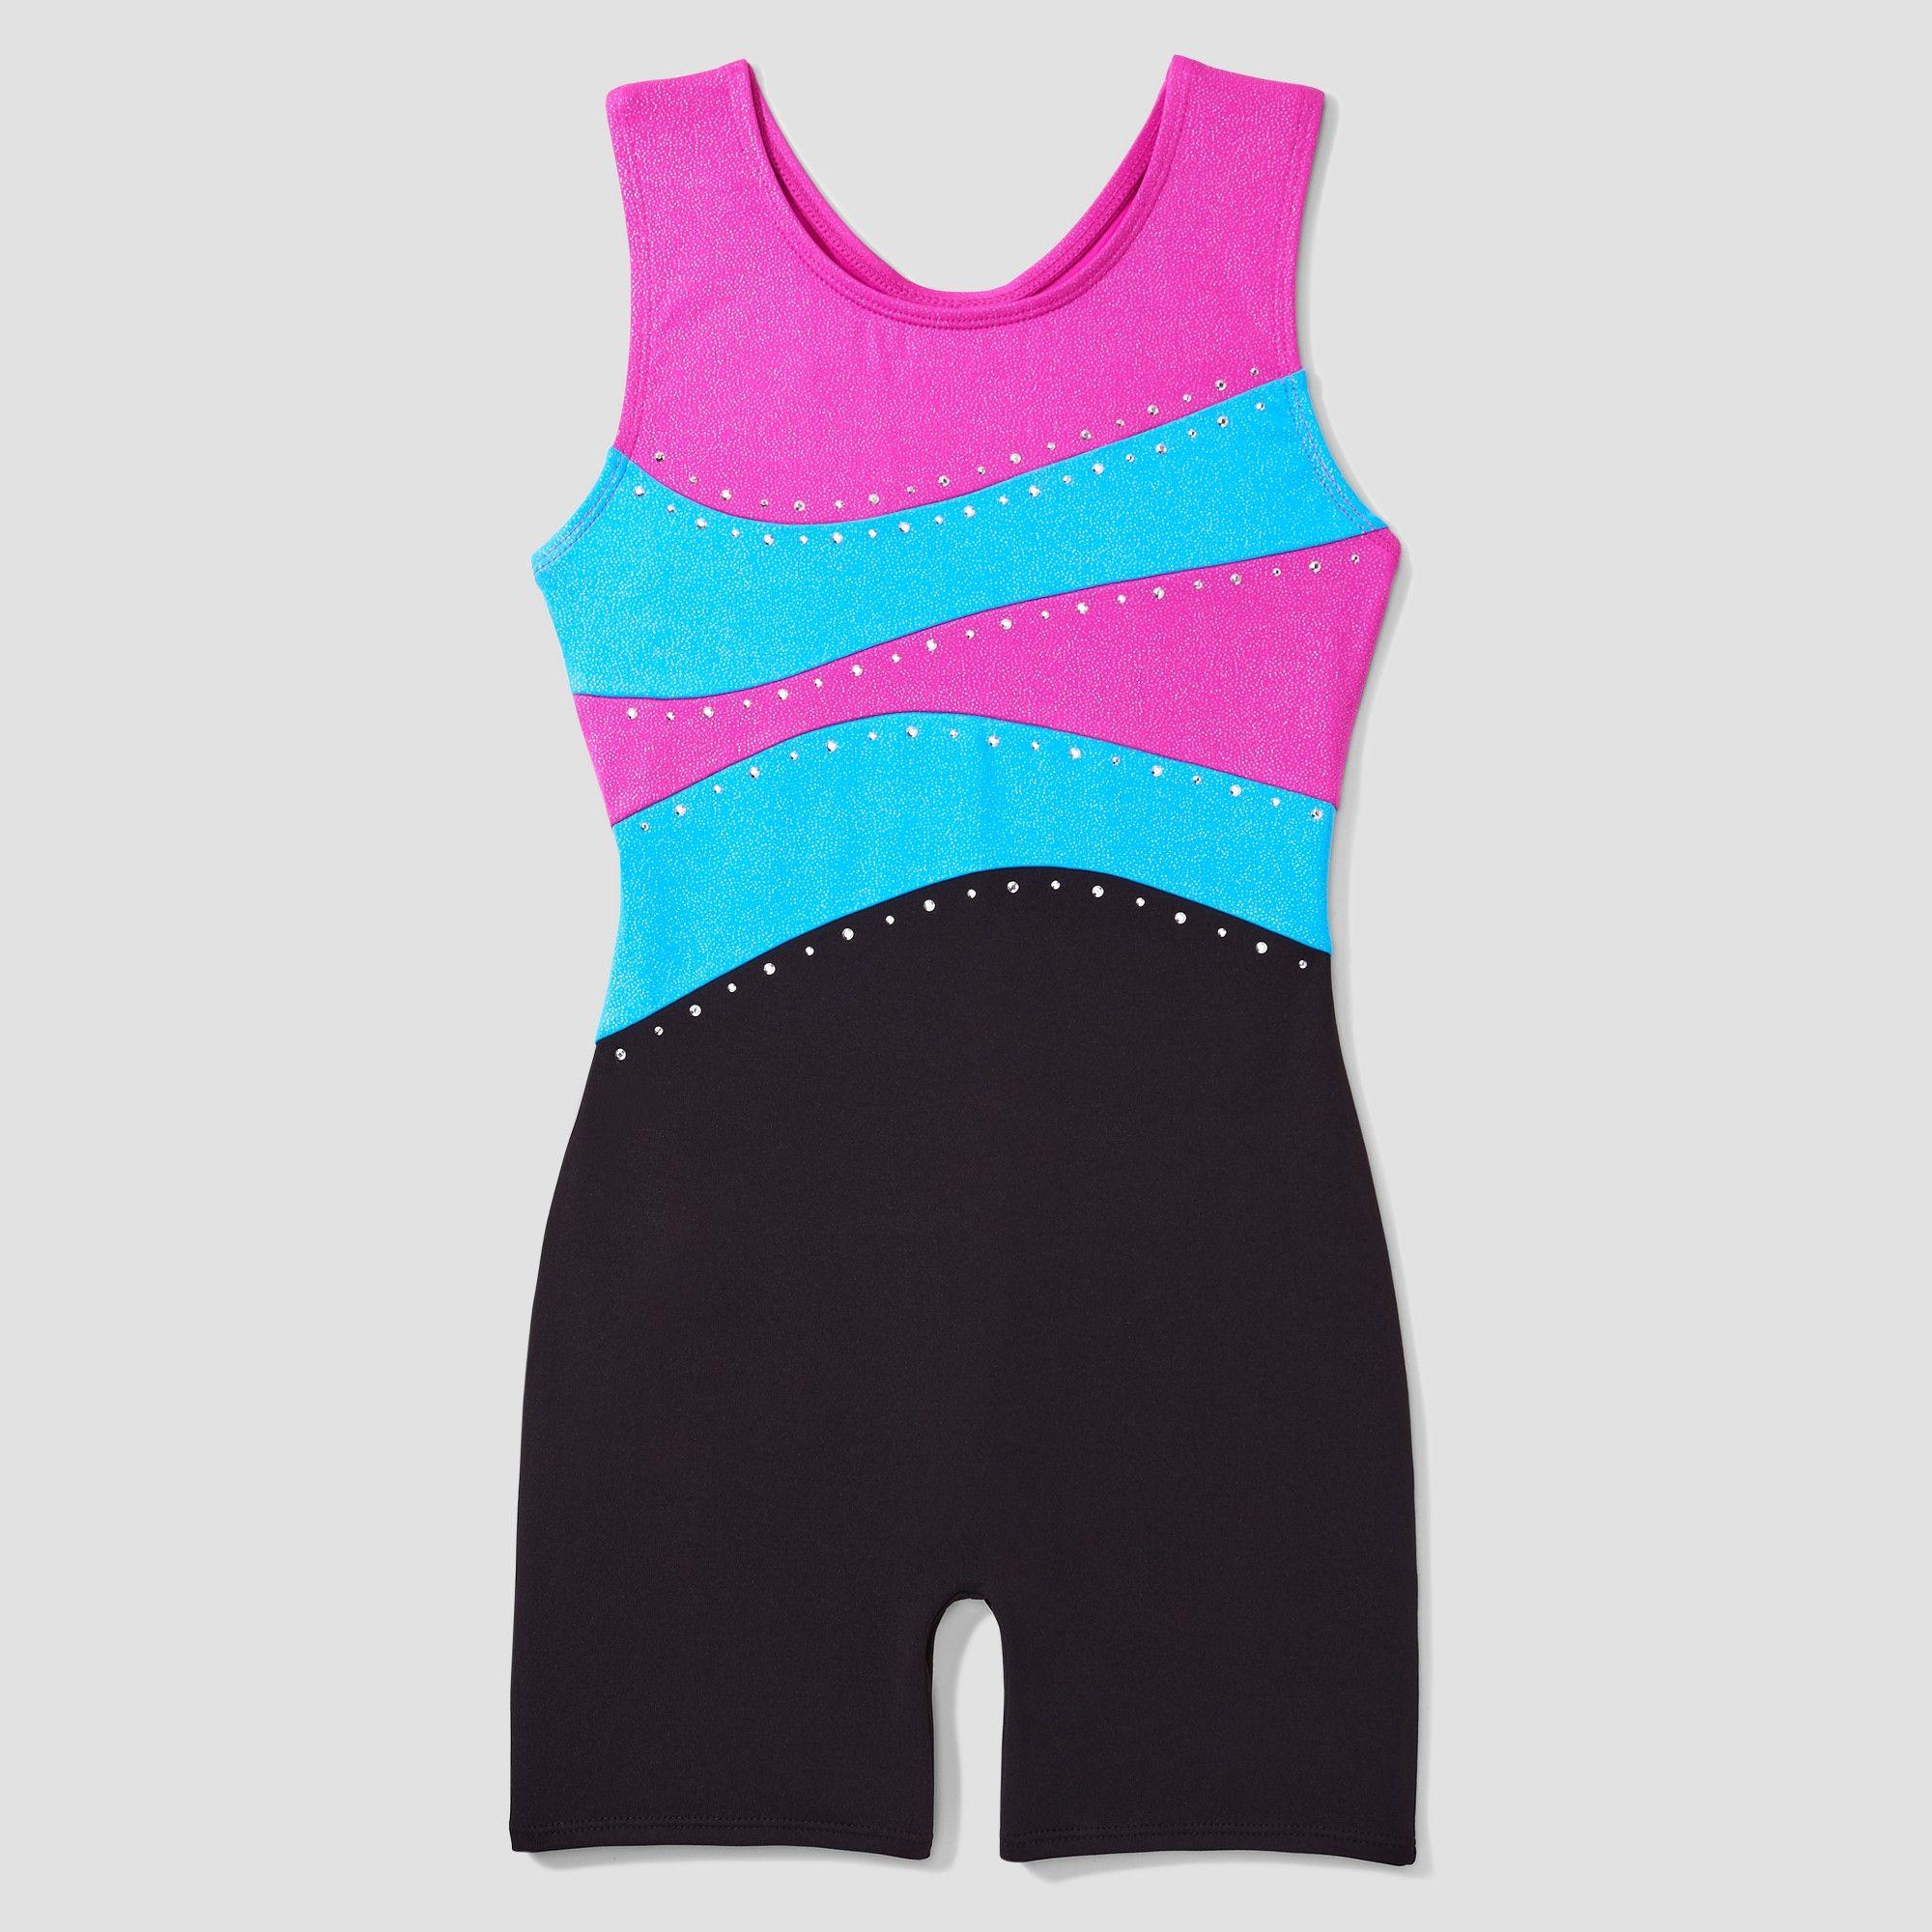 092ea8212d54 Freestyle by Danskin Toddler Girls  Activewear Biketard - Magenta ...